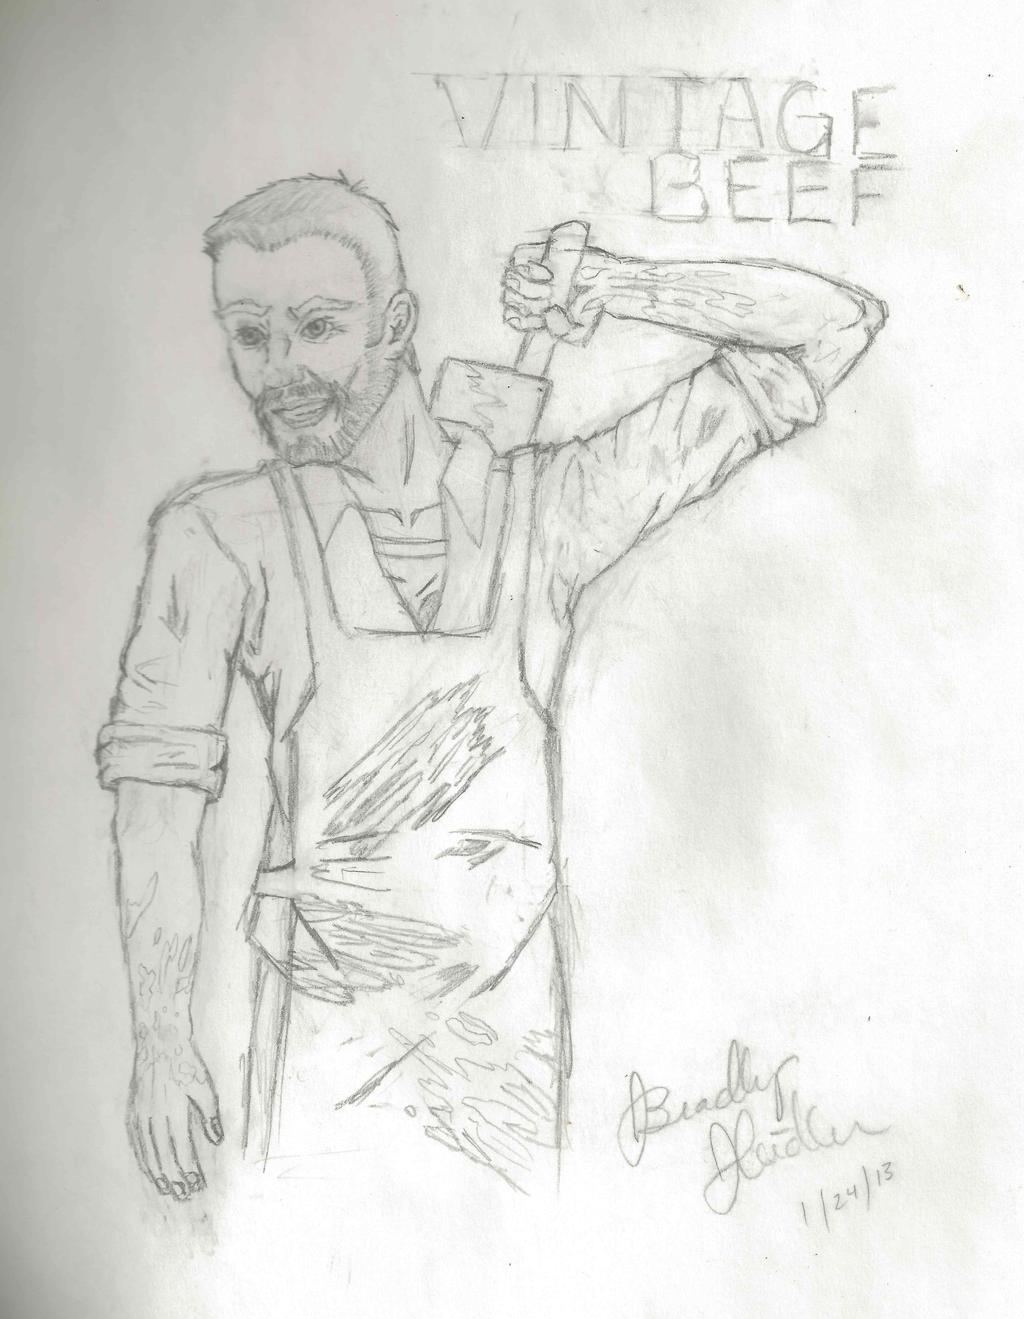 Vintage Beef by TaKKuN923